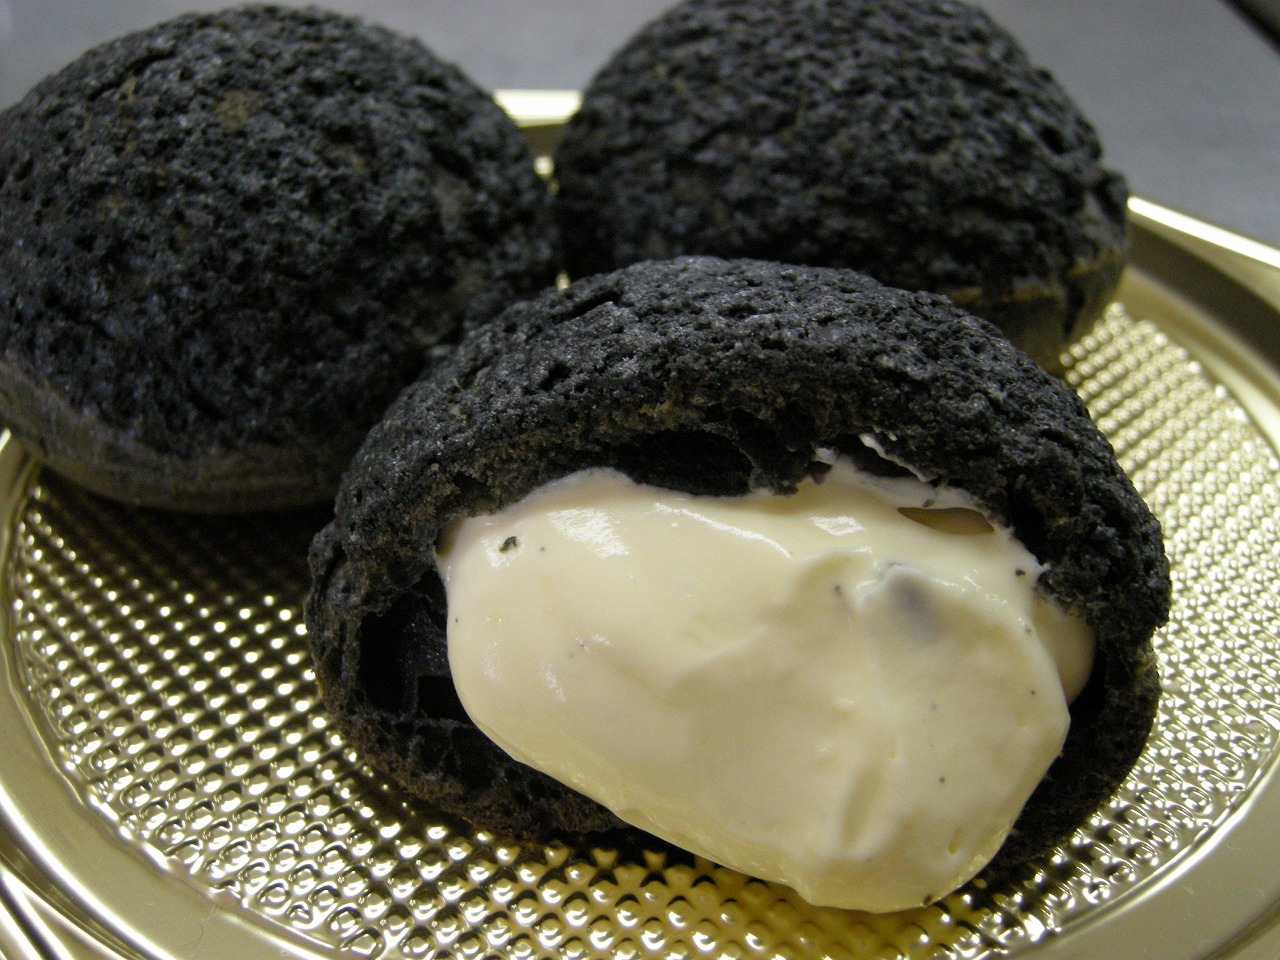 http://www.okashiya.info/wp-content/uploads/2012/09/8b04c3e634f87968a78d89929843daf41.jpg